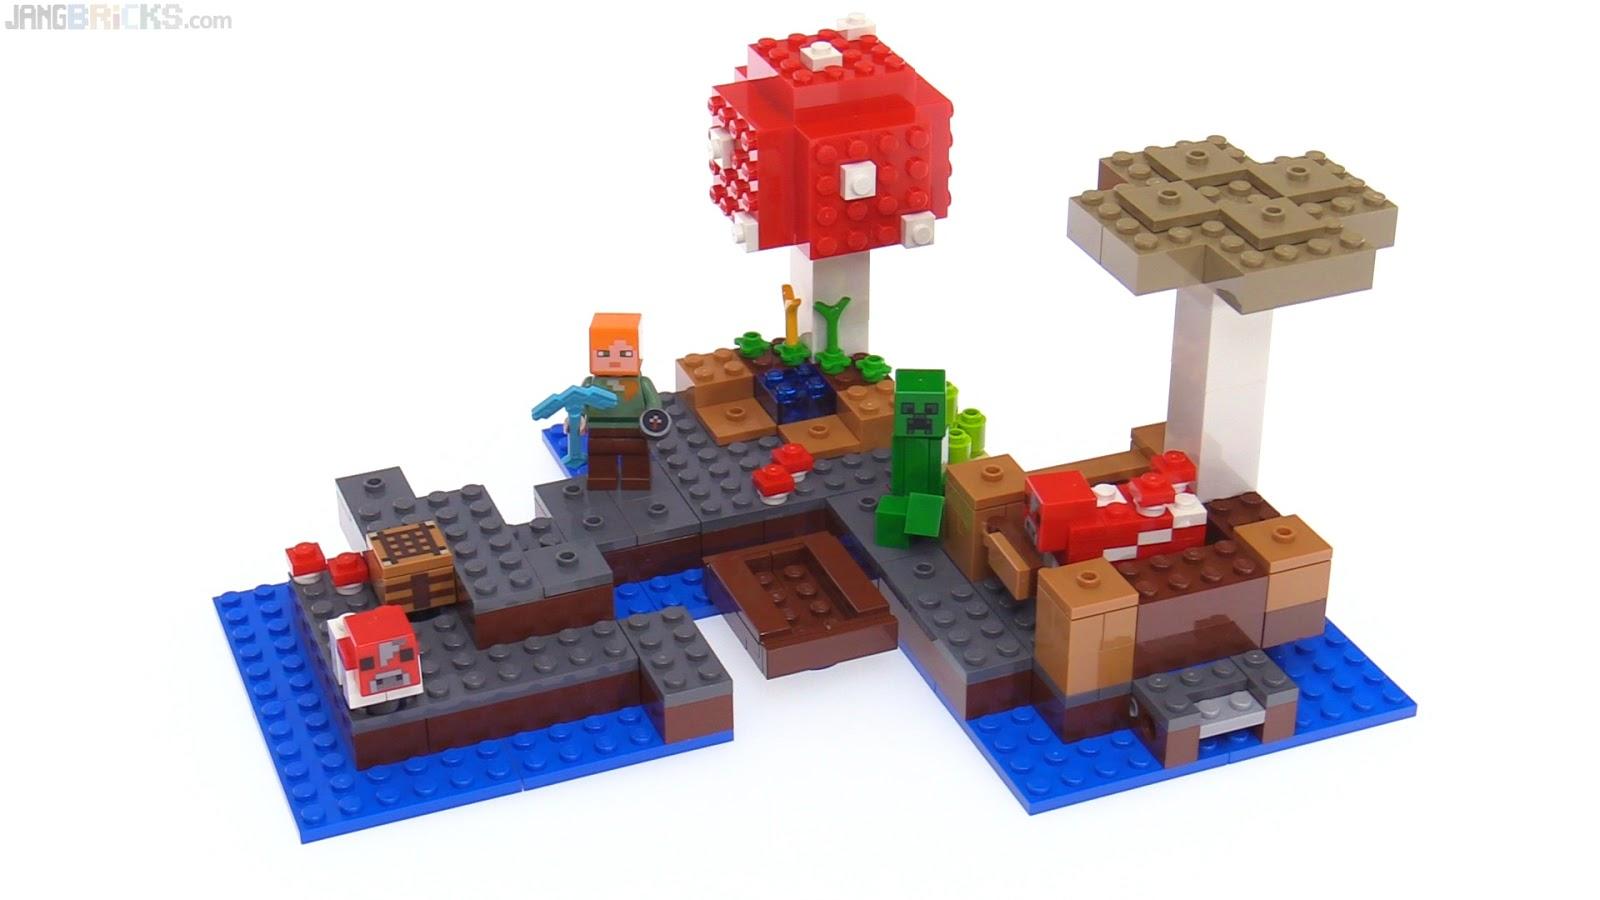 Jangbricks Lego Reviews Mocs February 2017 21133 Minecraft The Witch Hut Mooshroom Island Review 21129